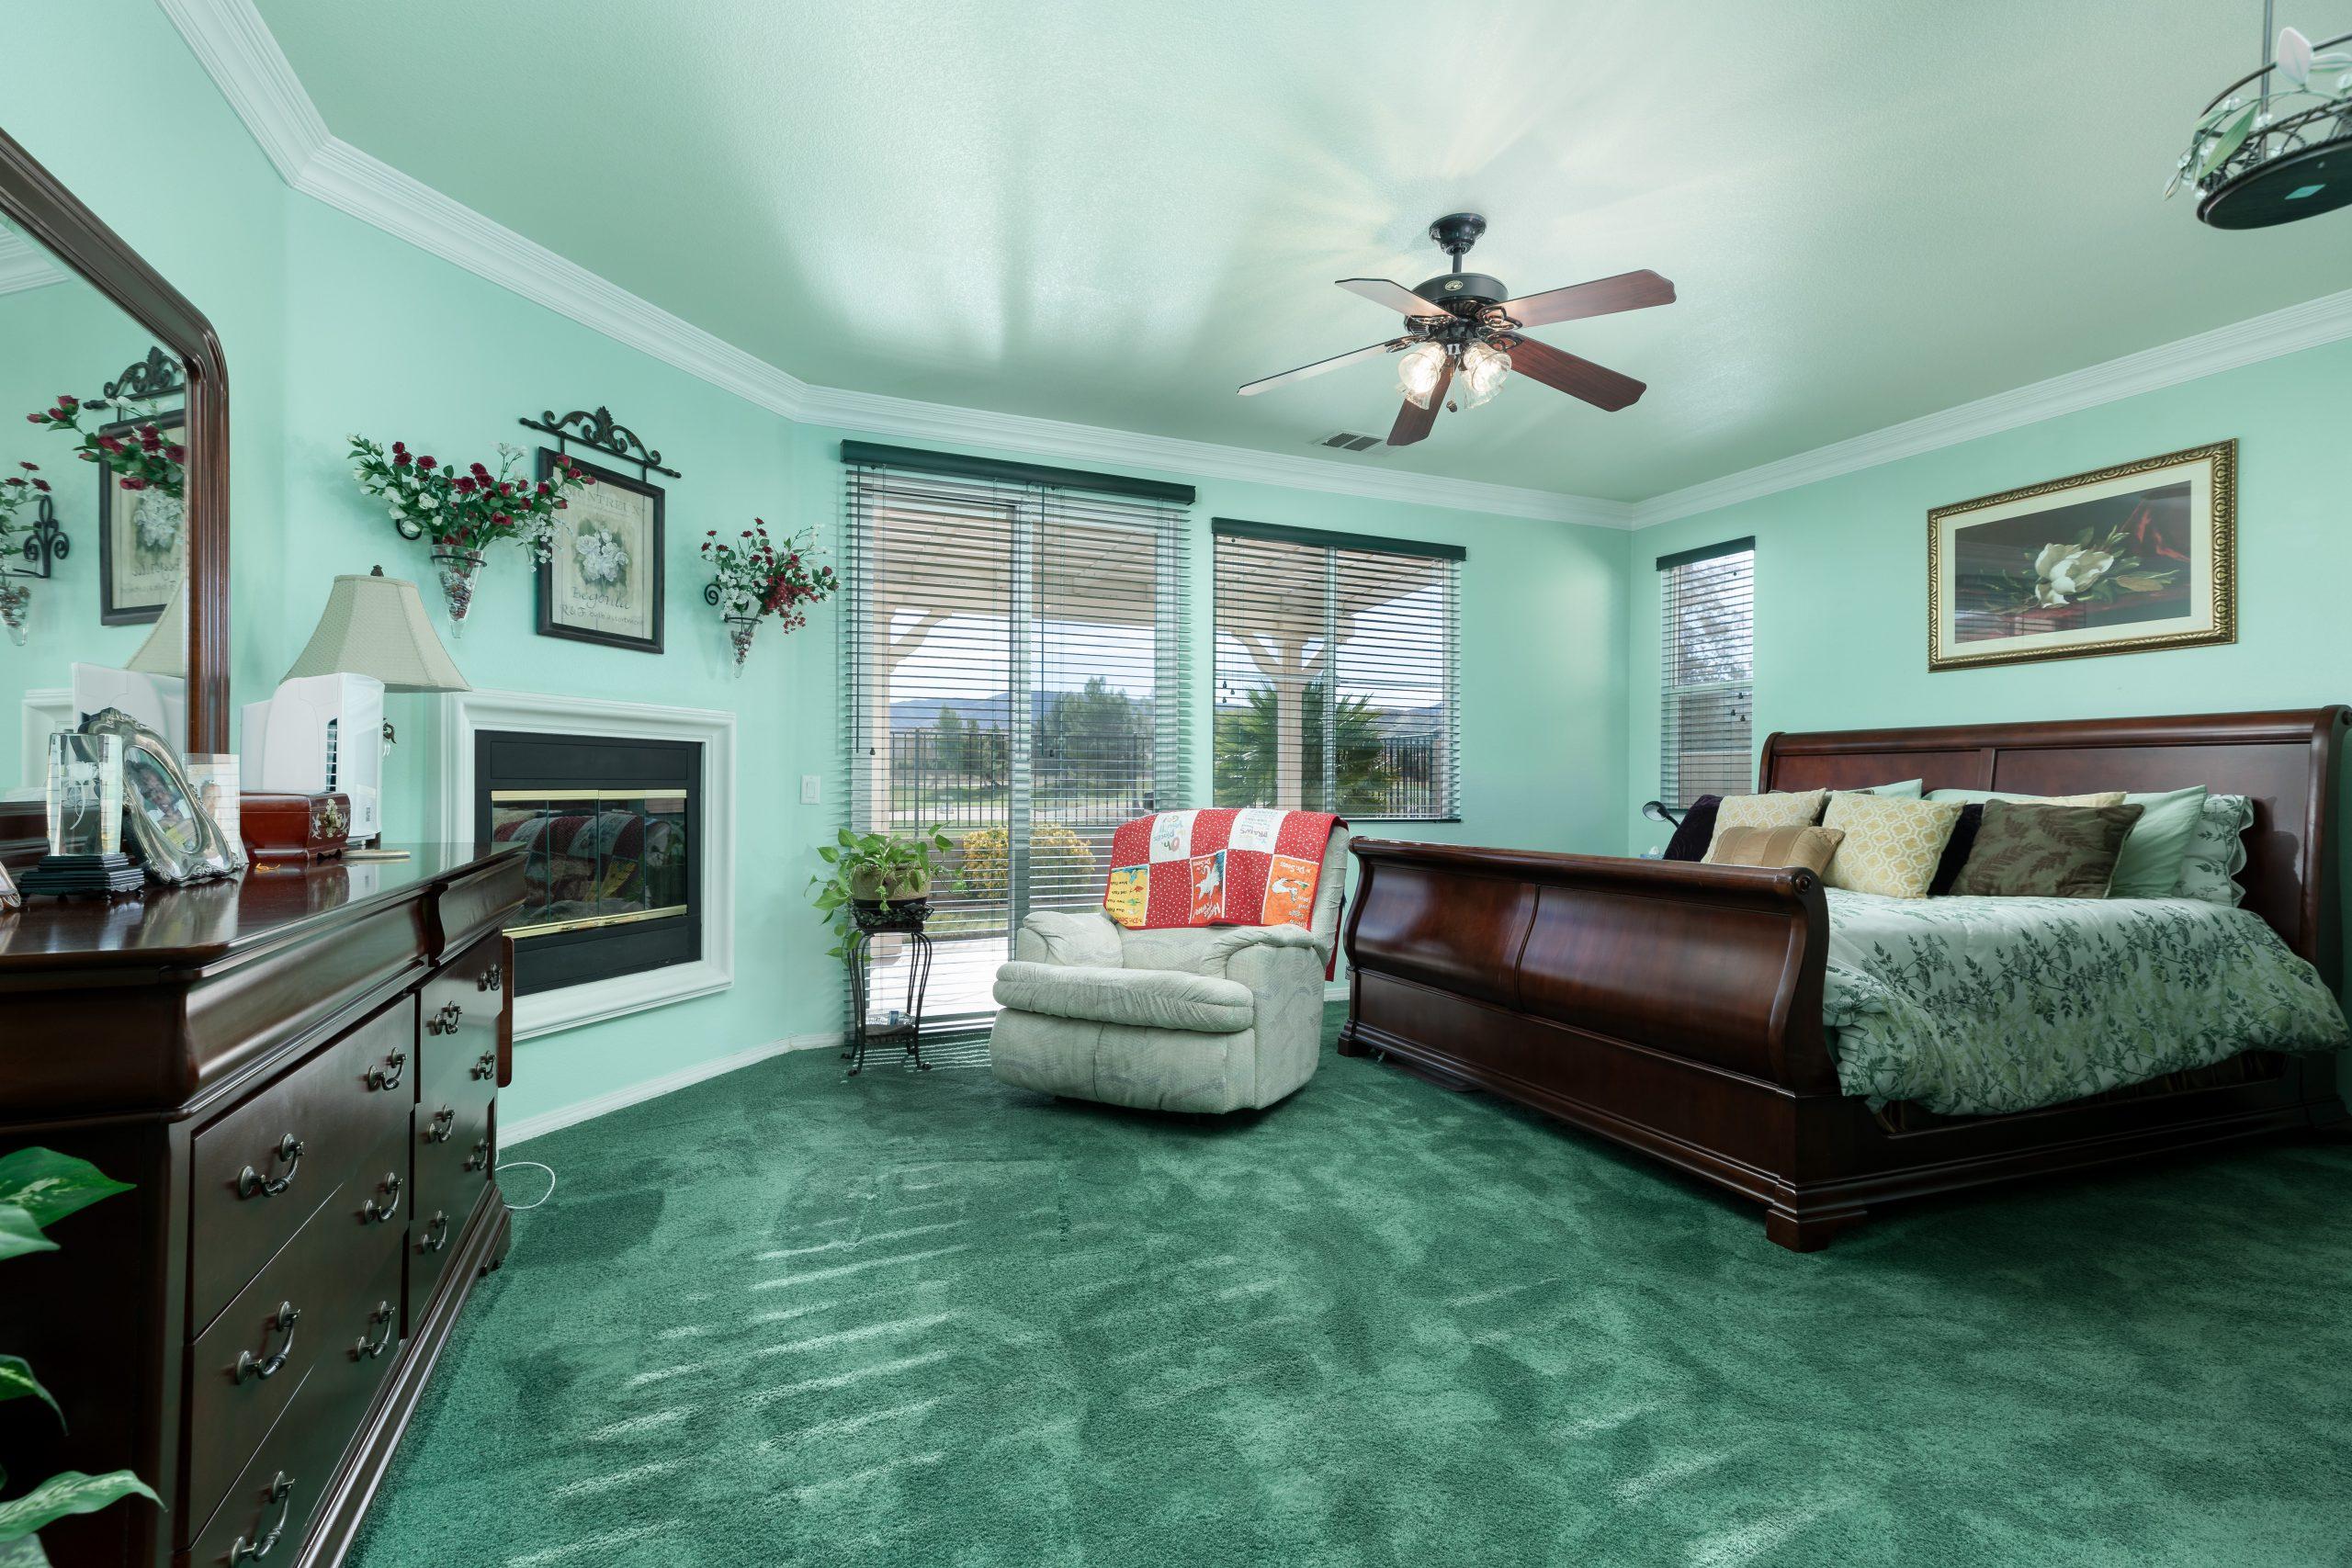 3364 Tournament Drive Palmdale CA 93551 Master Bedroom